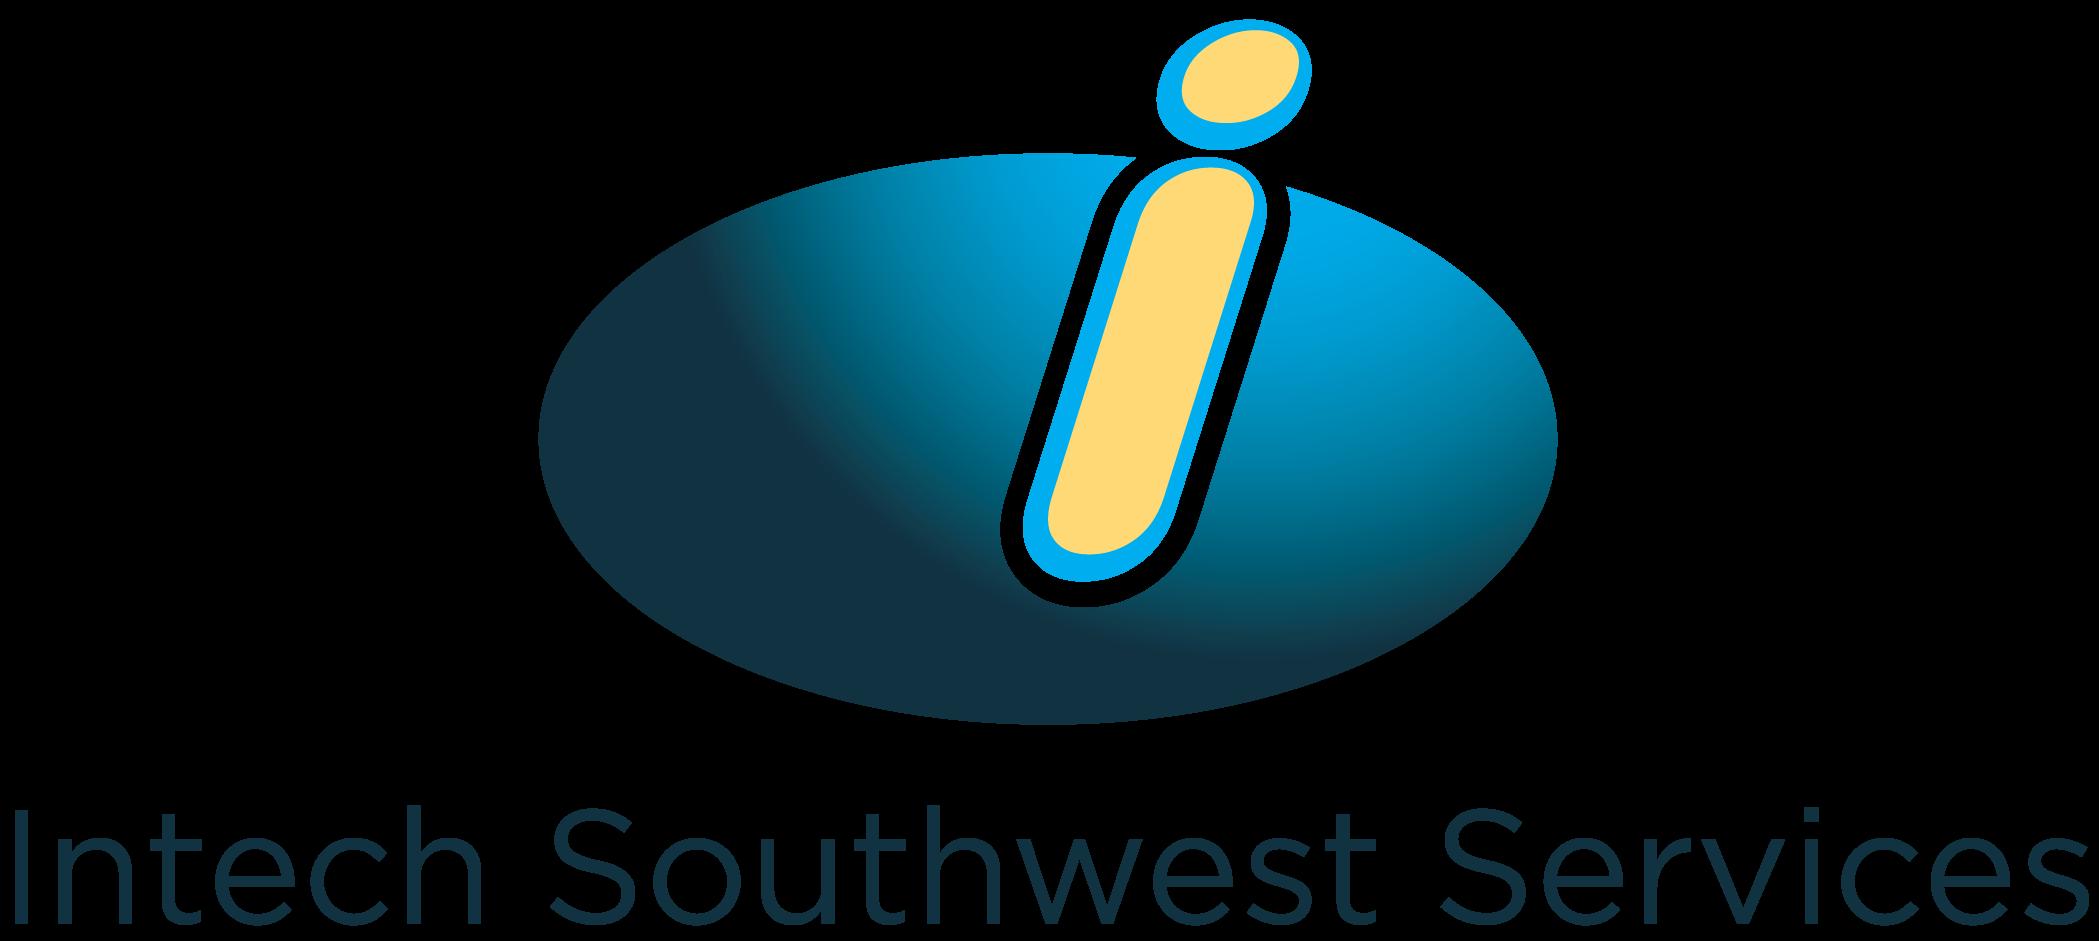 intech southwest graphic